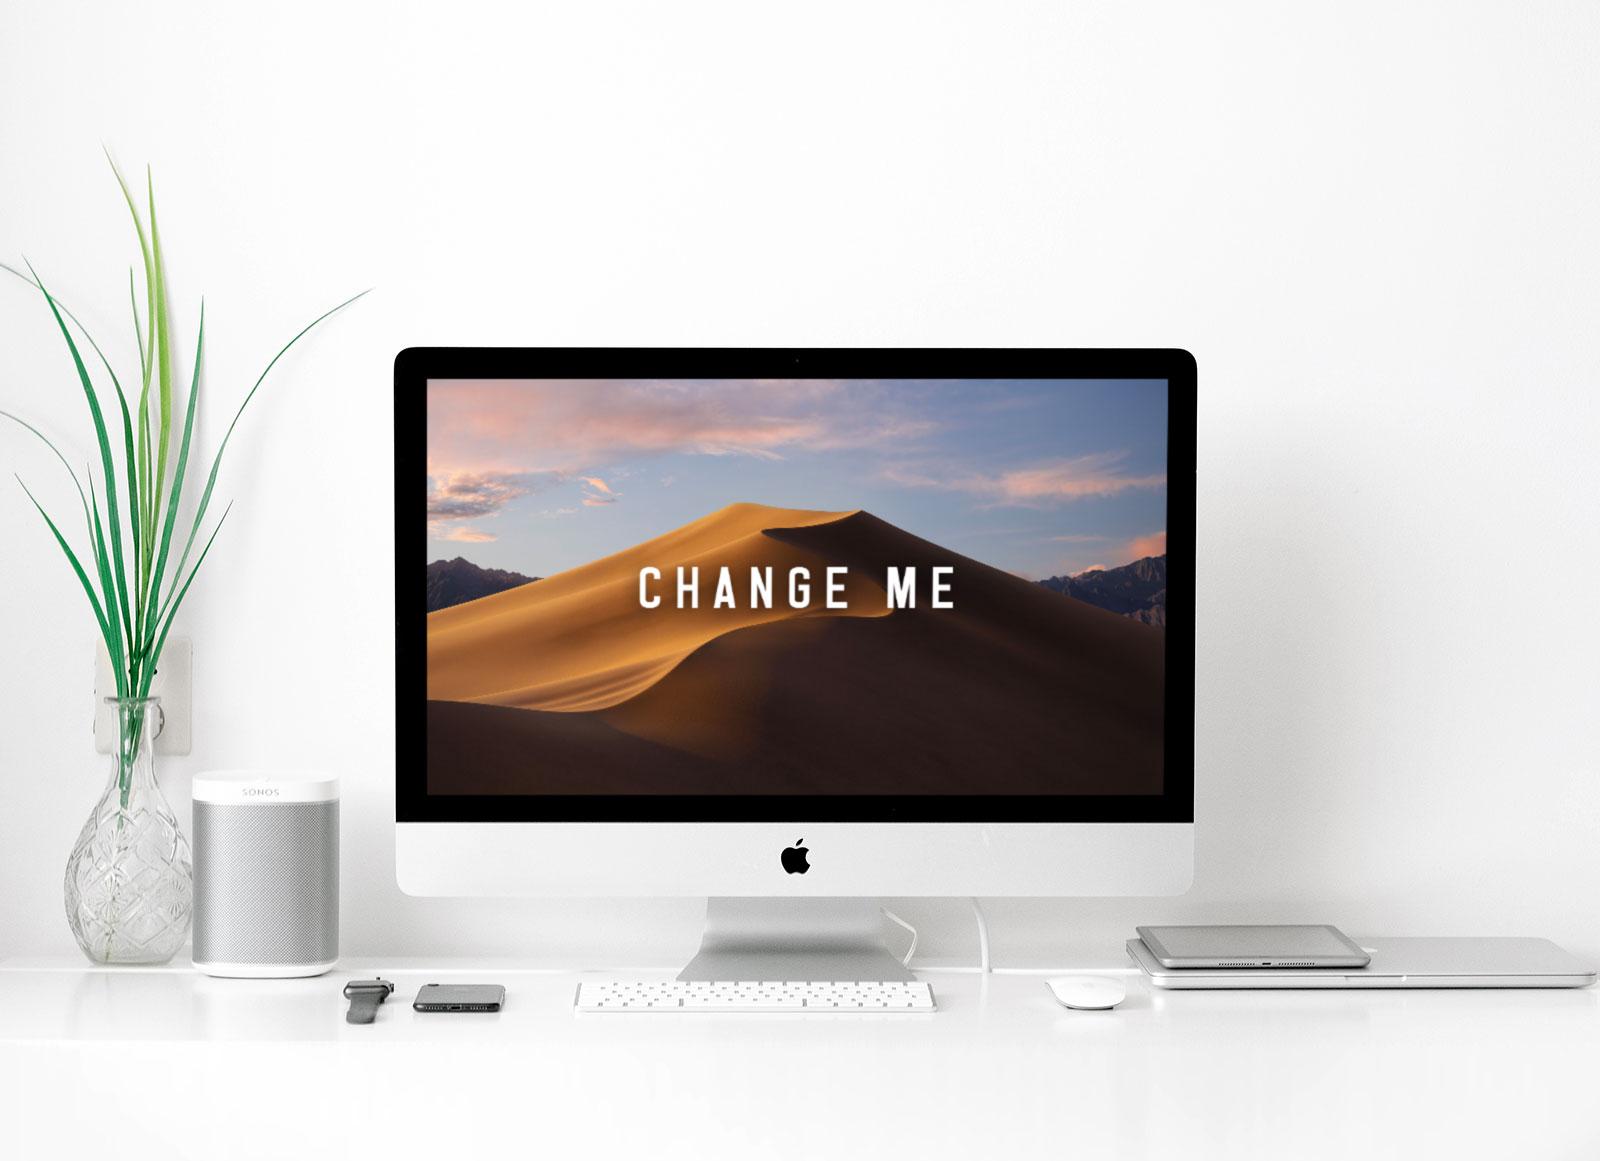 Free-White-Apple-iMac-Mockup-PSD